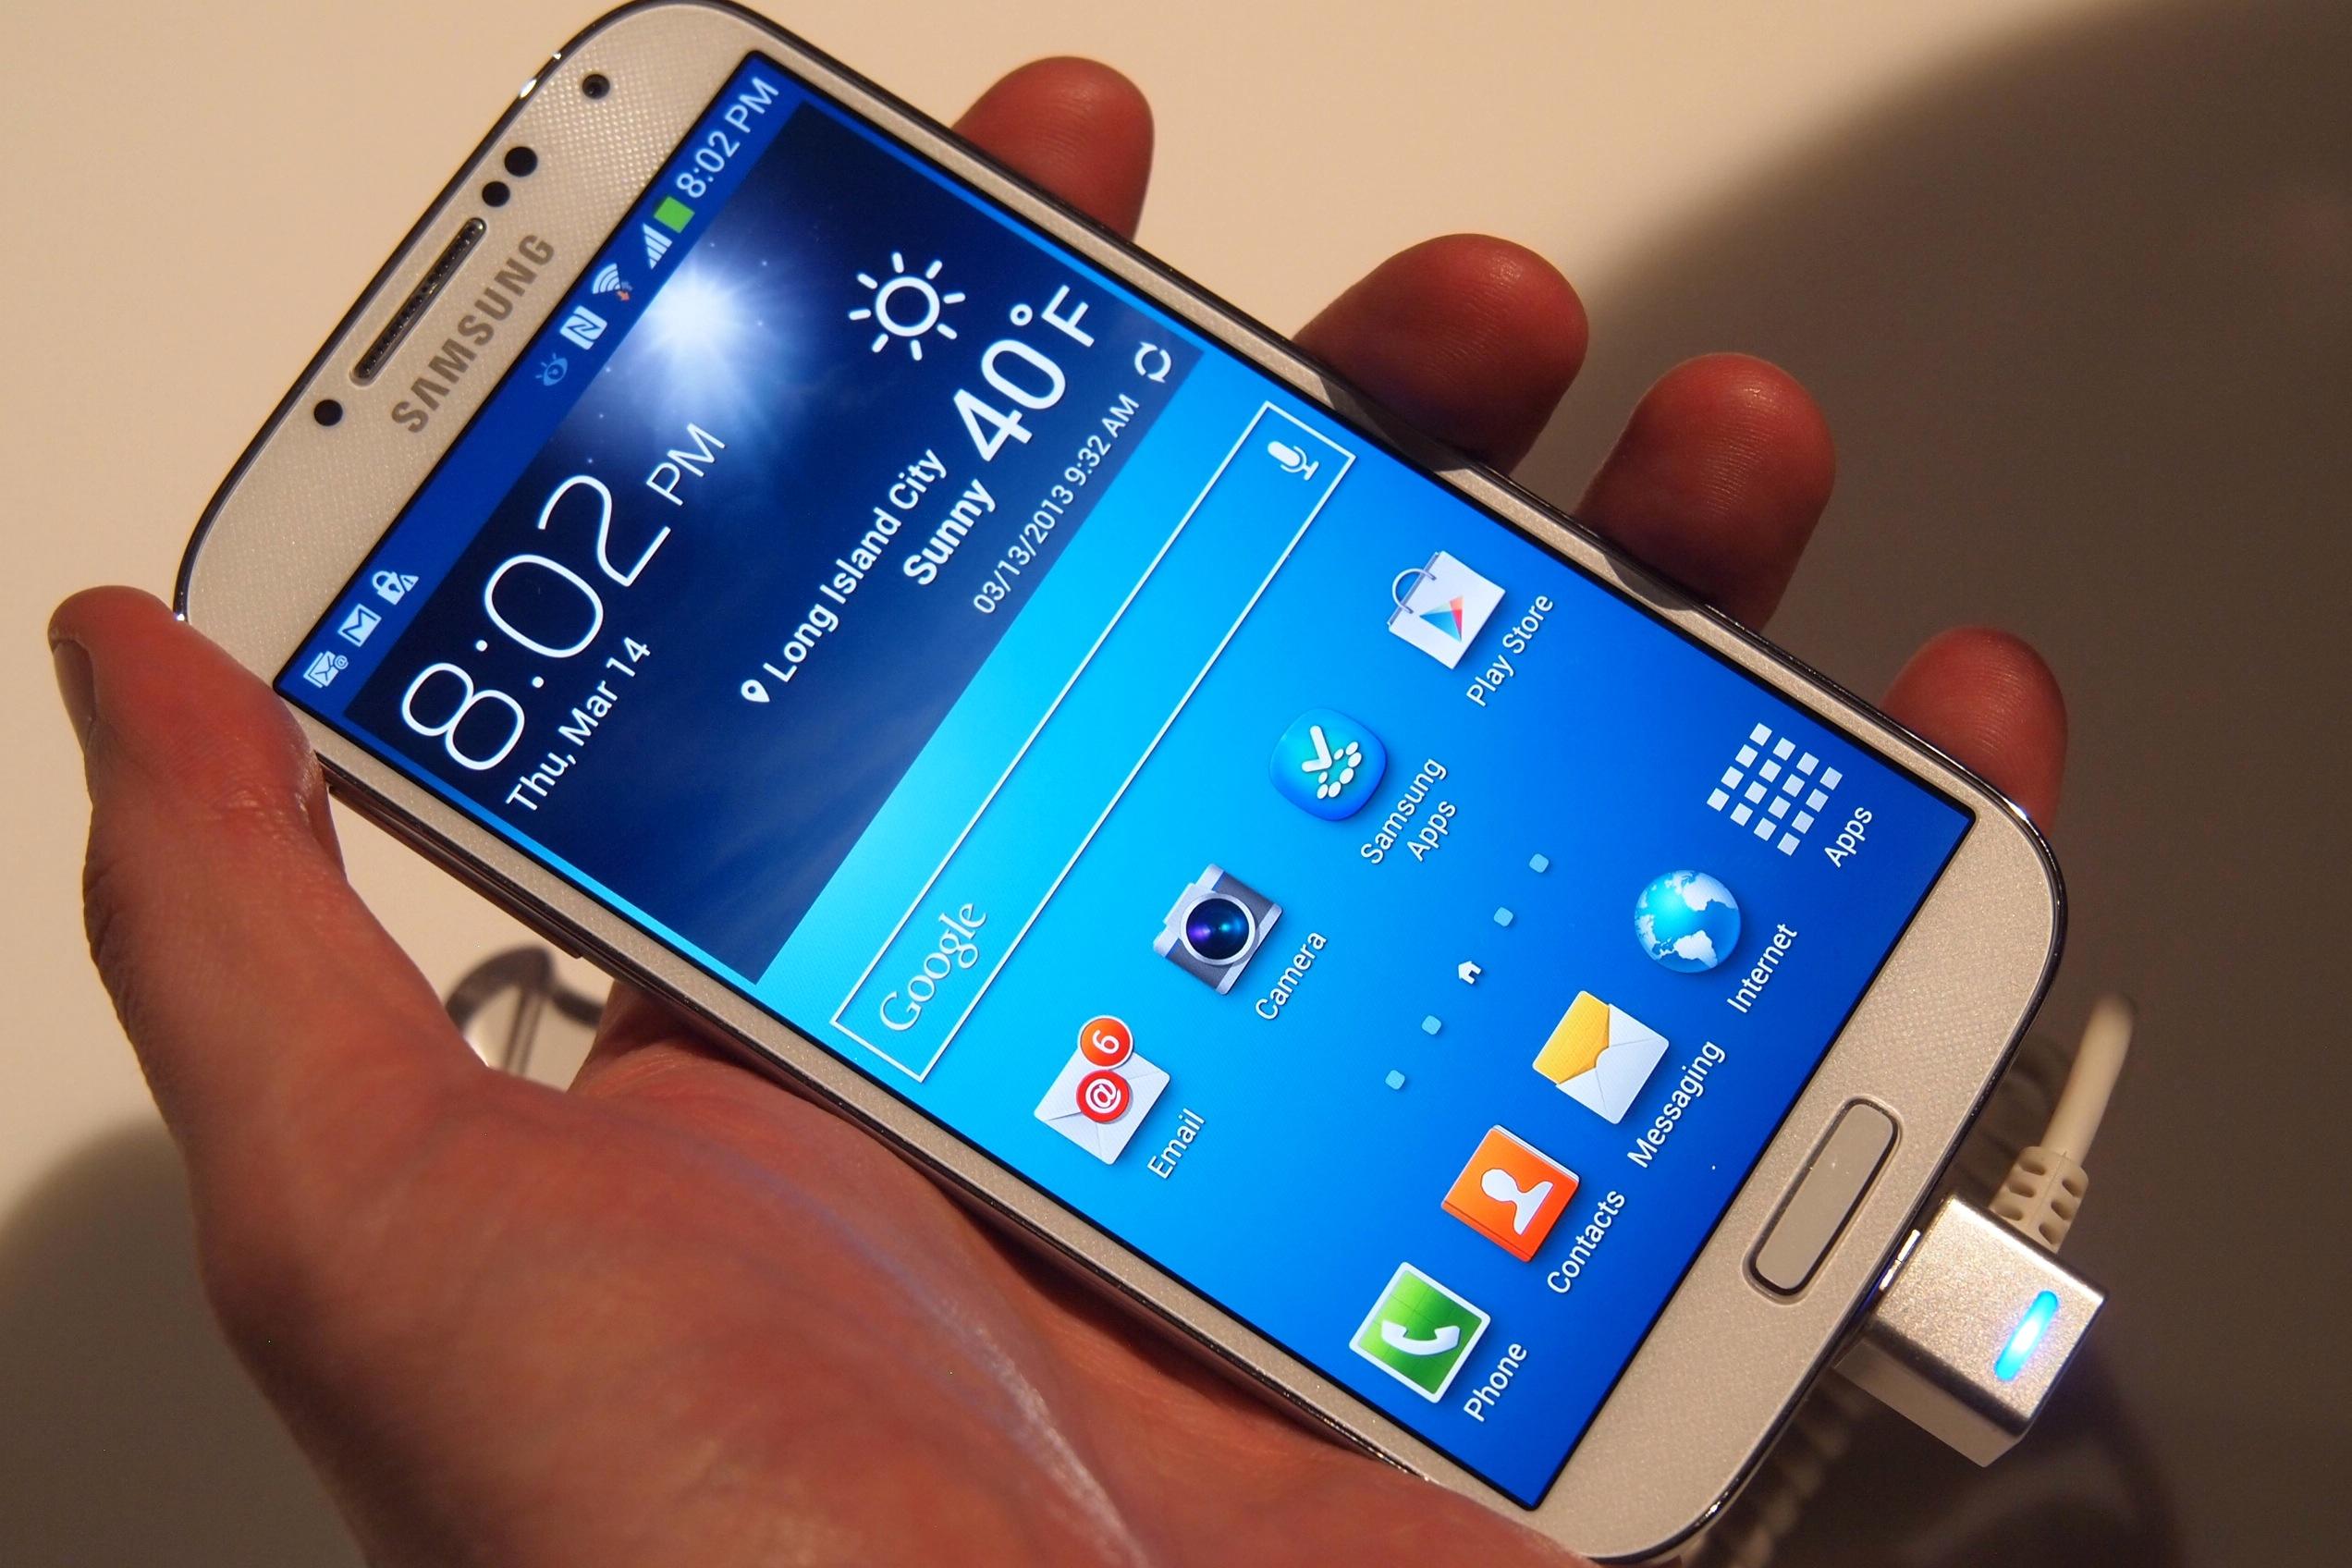 Samsung-Galaxy-S4-angled.jpg